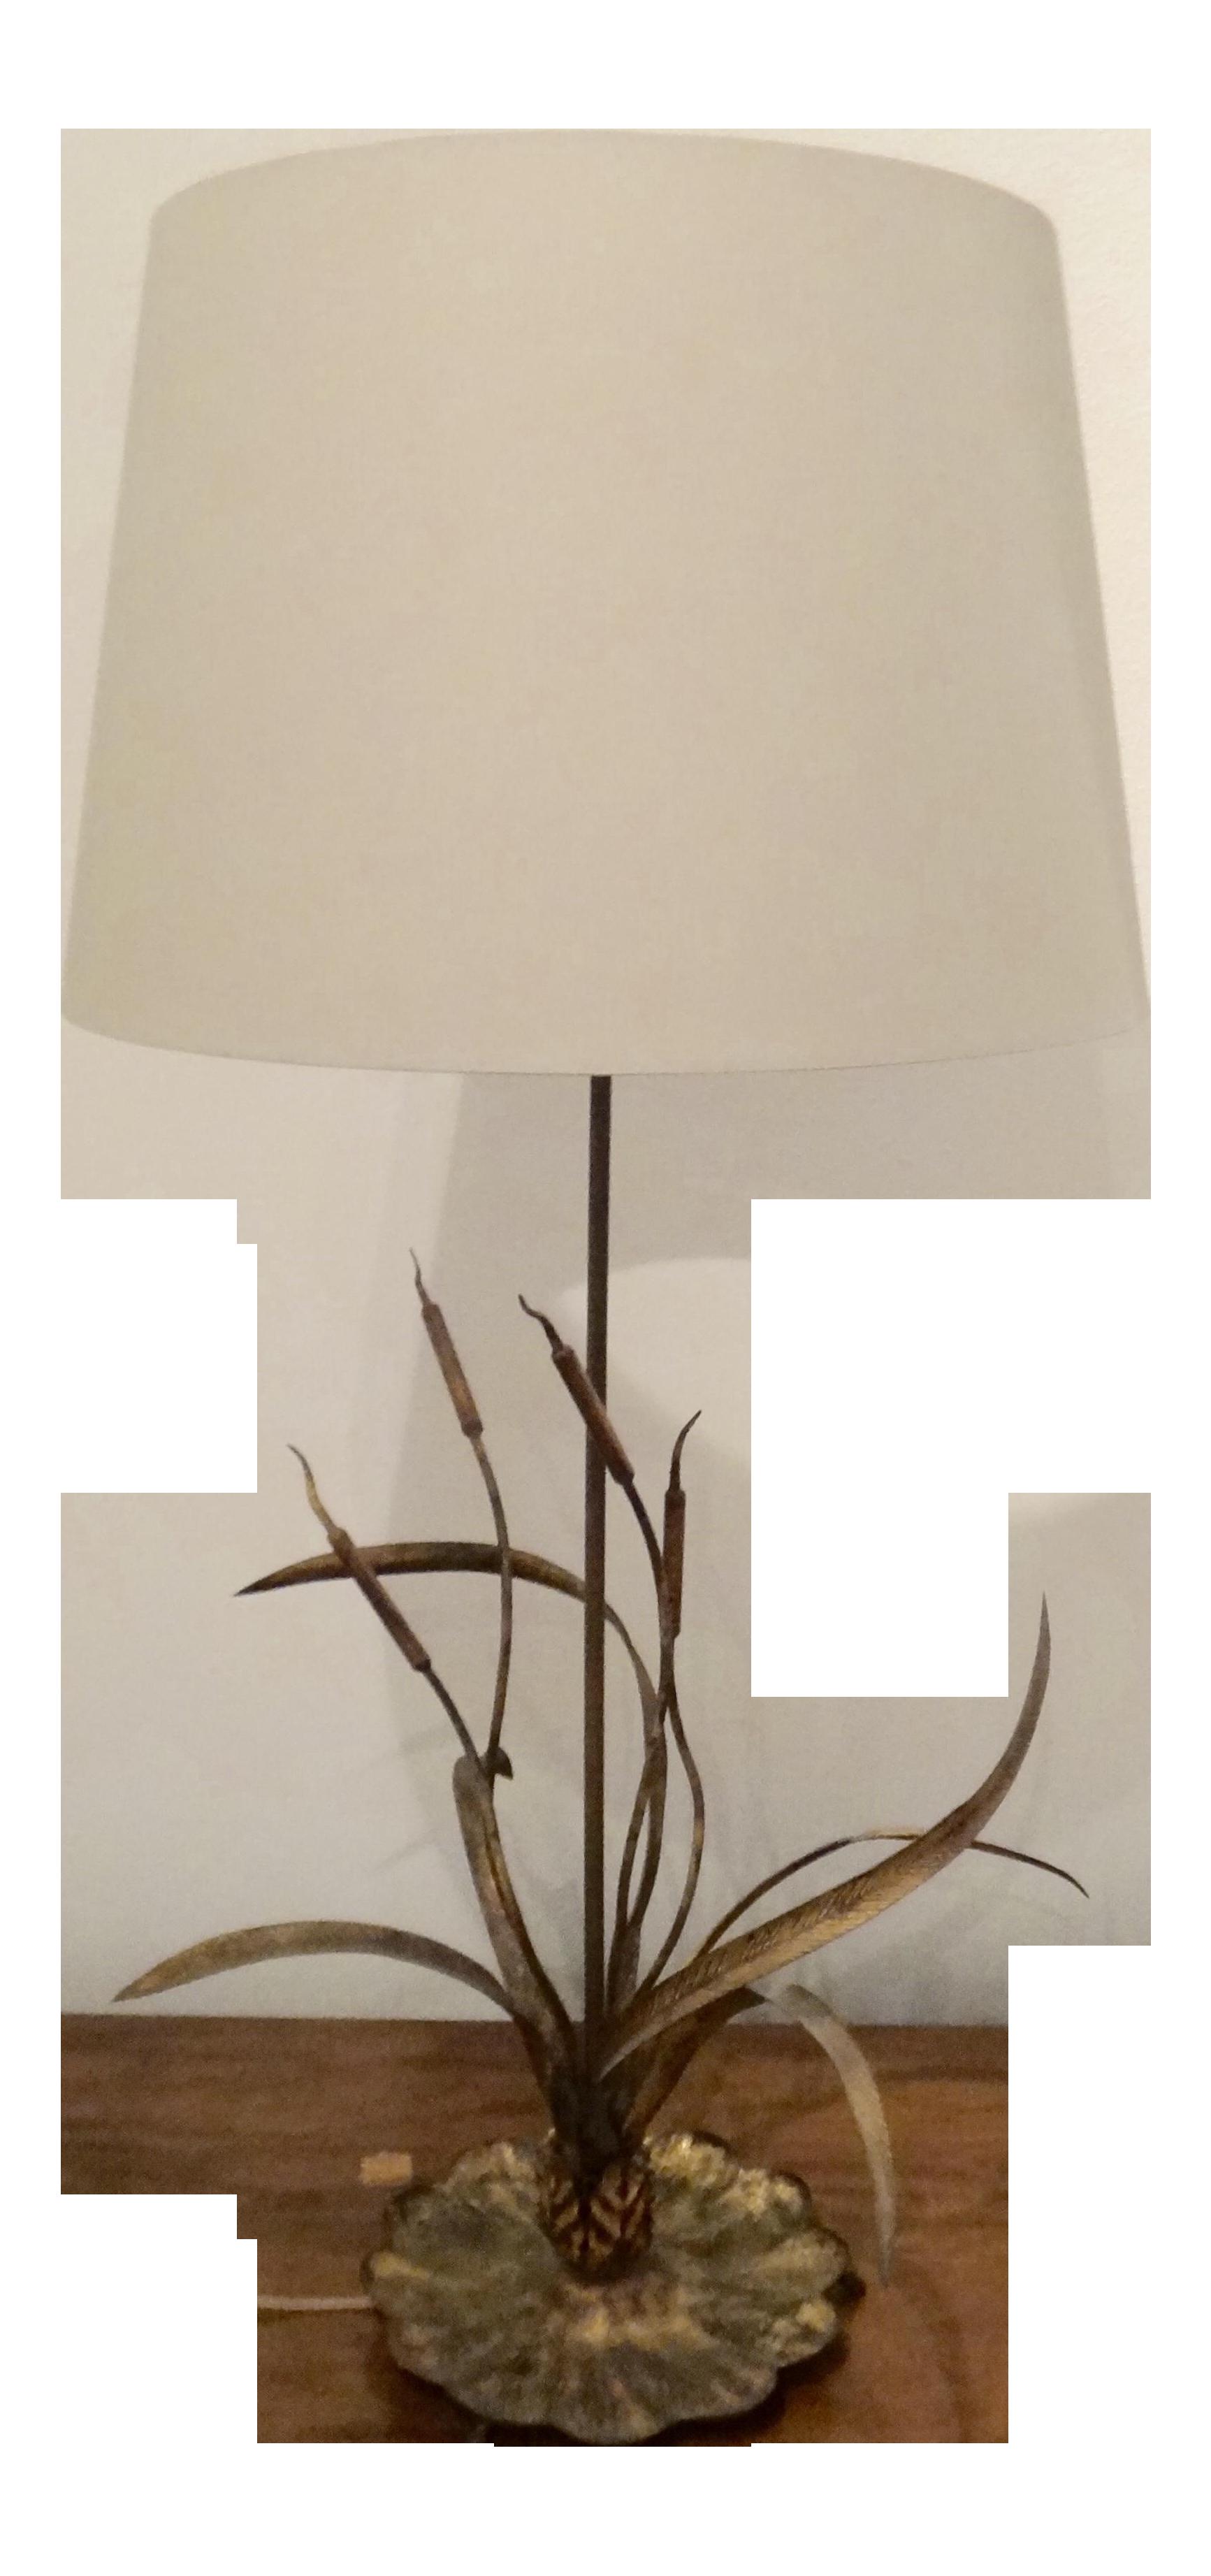 Gilt Cattail Reed Sculptural Table Lamp Chairish